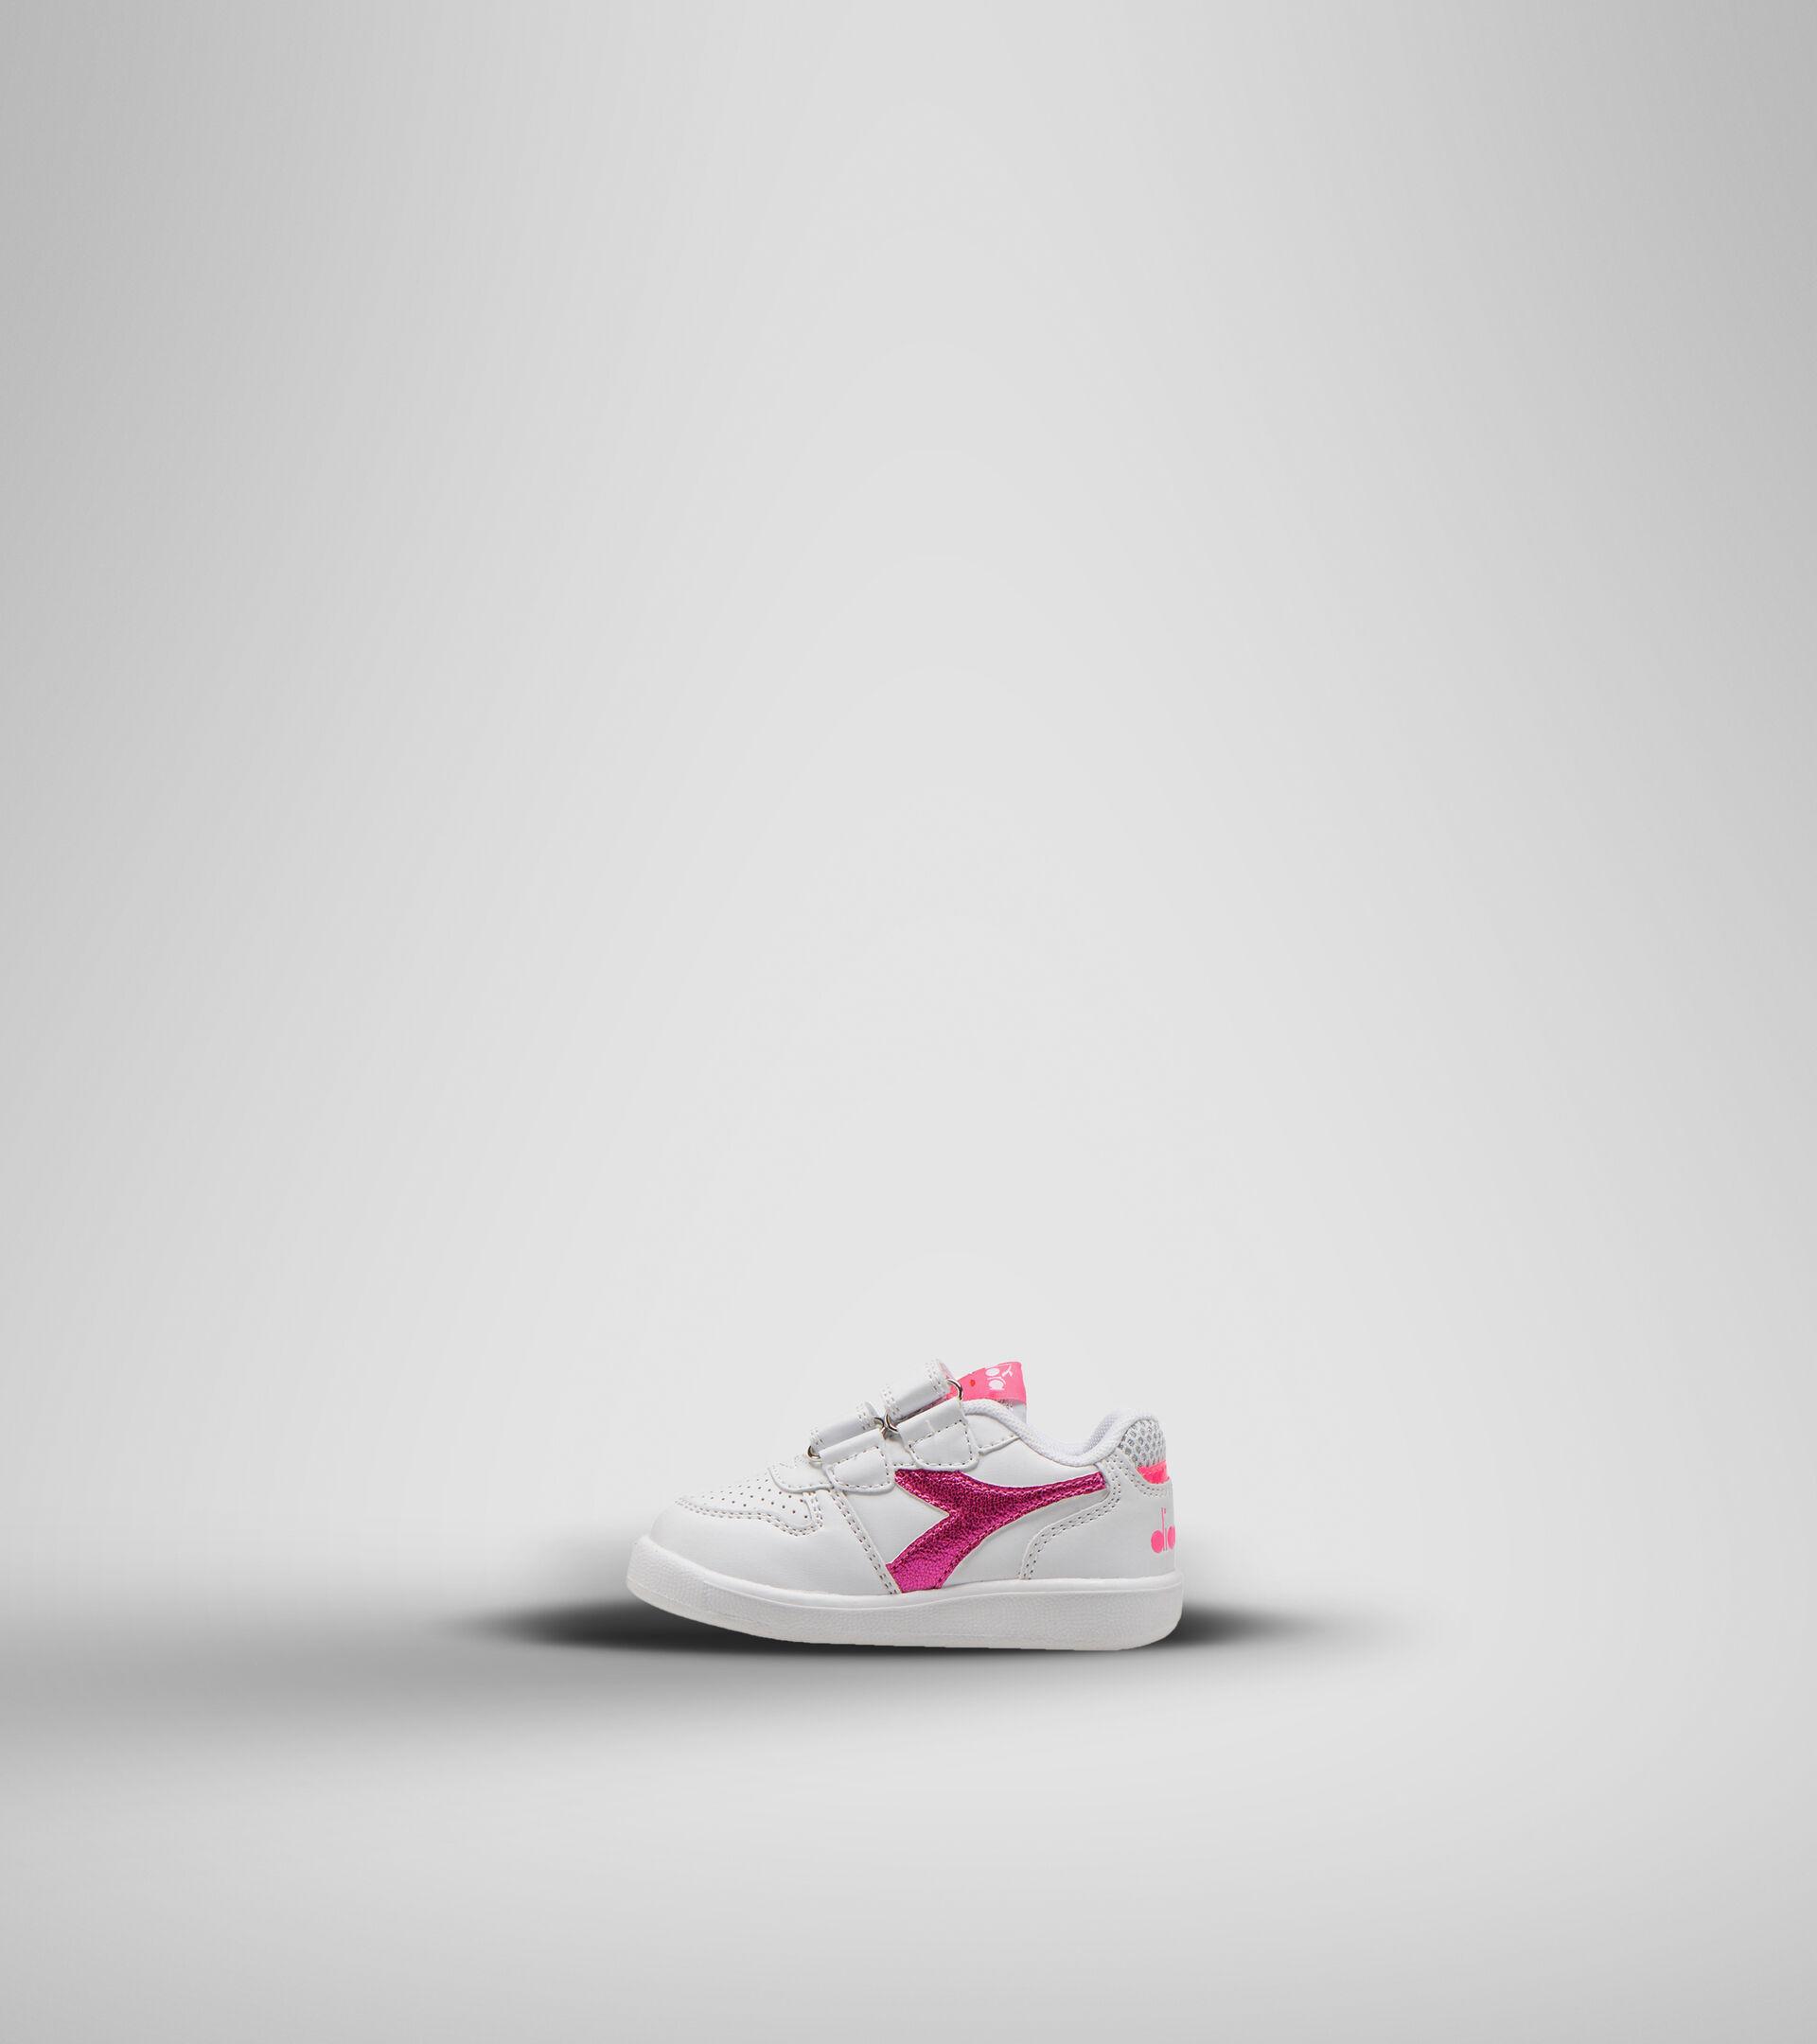 Chaussures de sport - Bambins 1-4 ans PLAYGROUND TD GIRL BLANC/ROSE FLUO - Diadora